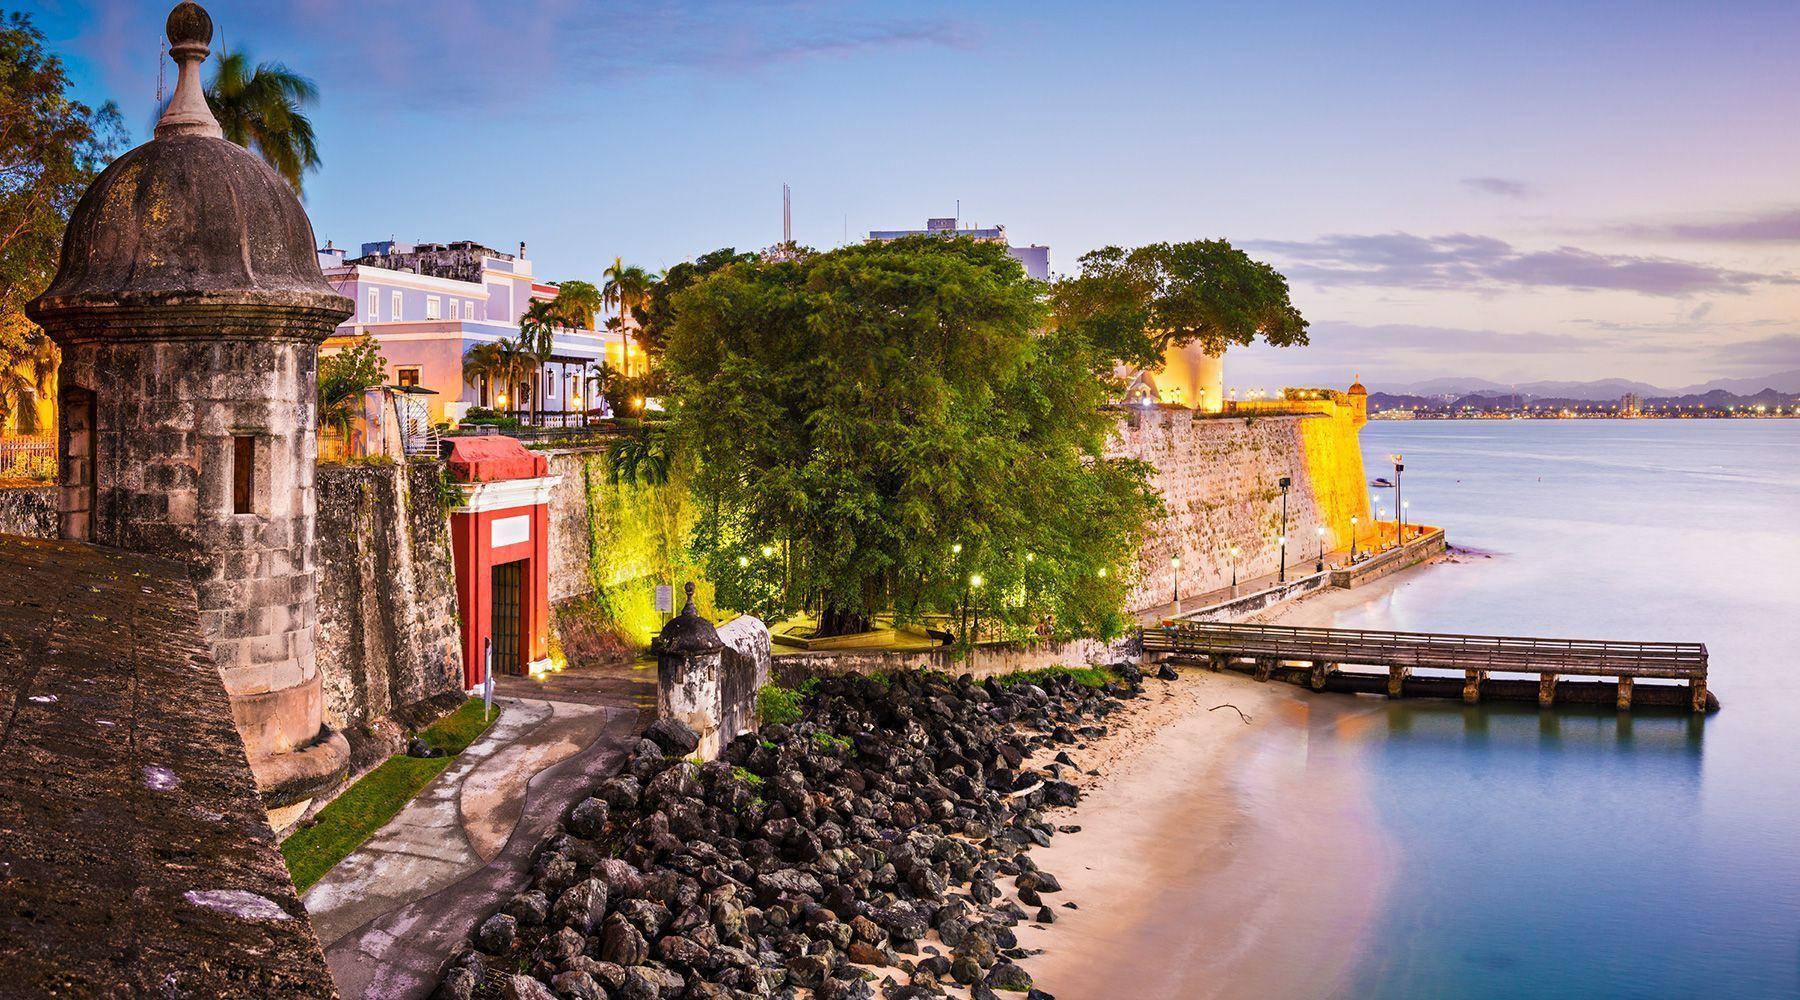 ciudades latinoamericanas.